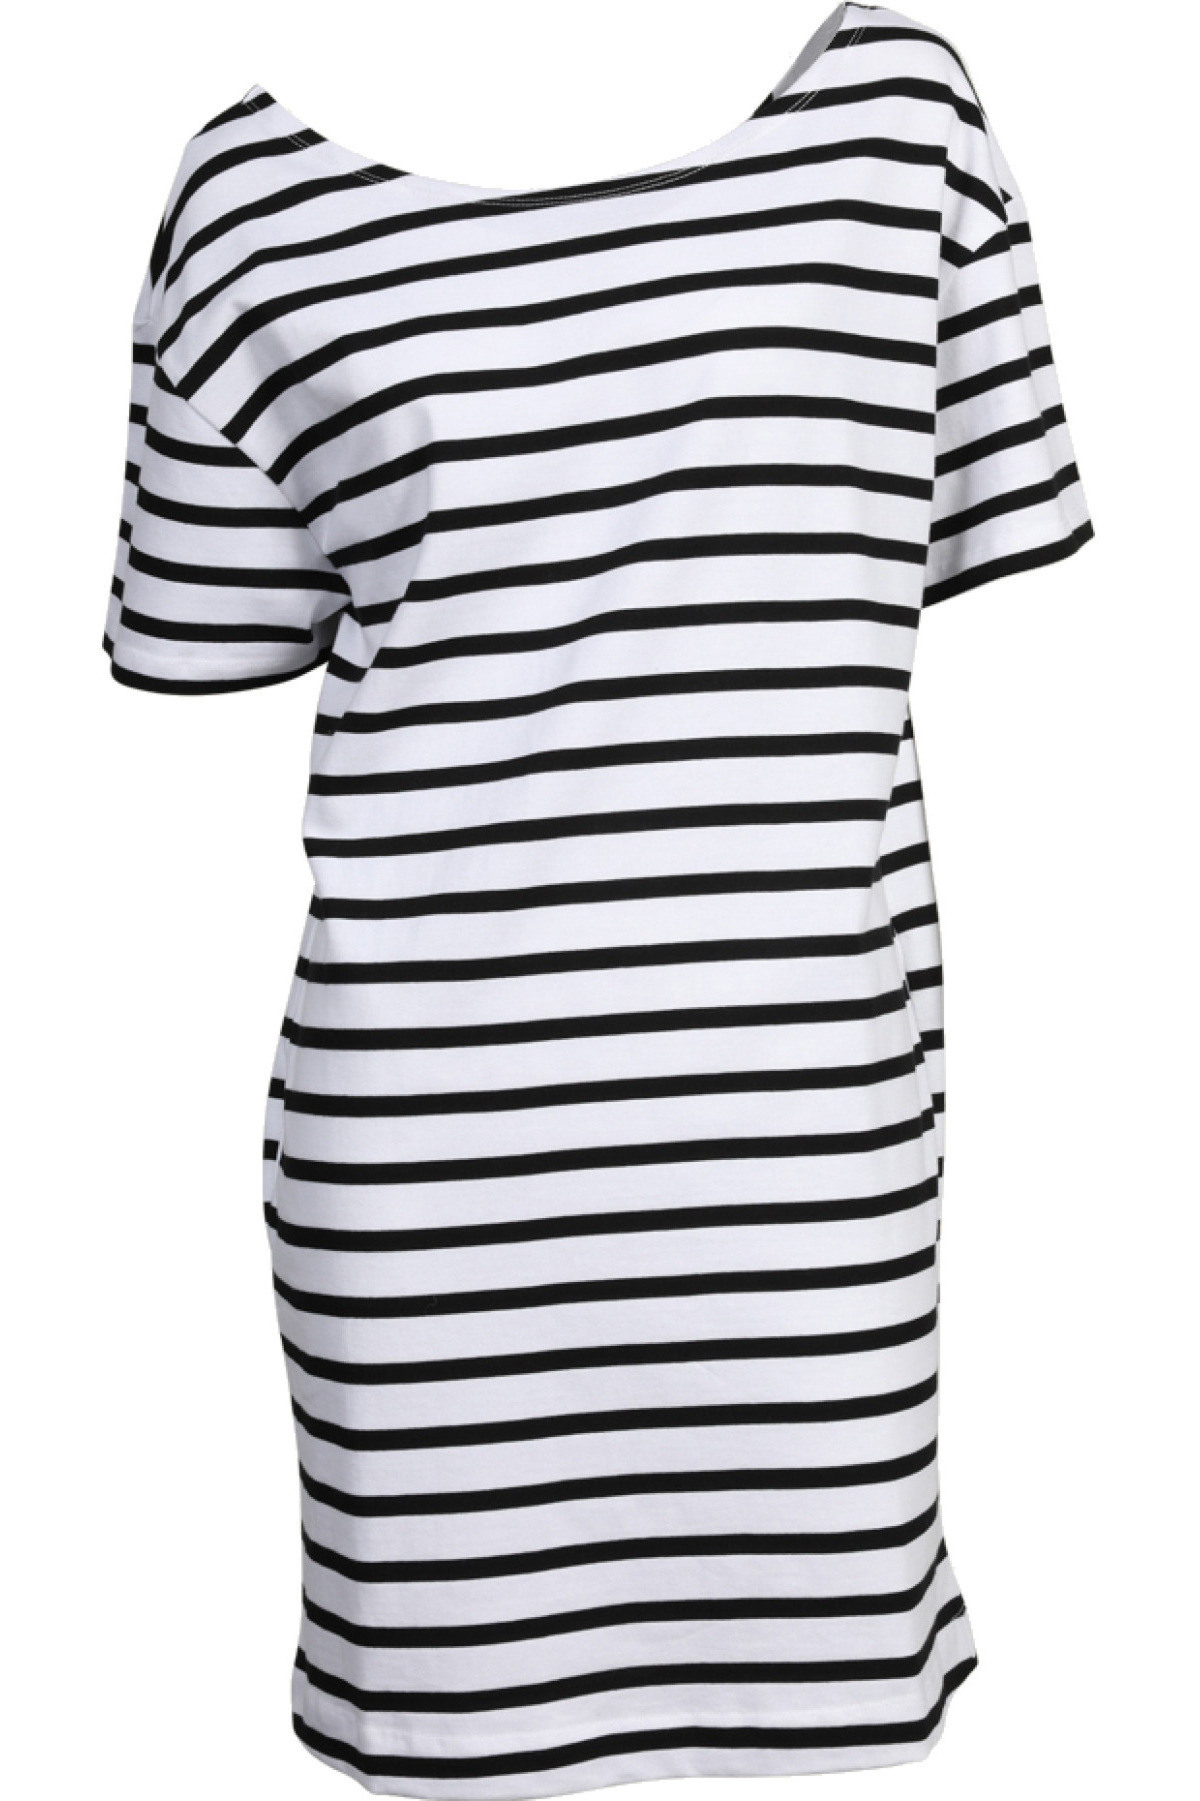 American Vintage Kleid Rico Gestreift In Schwarzweiss